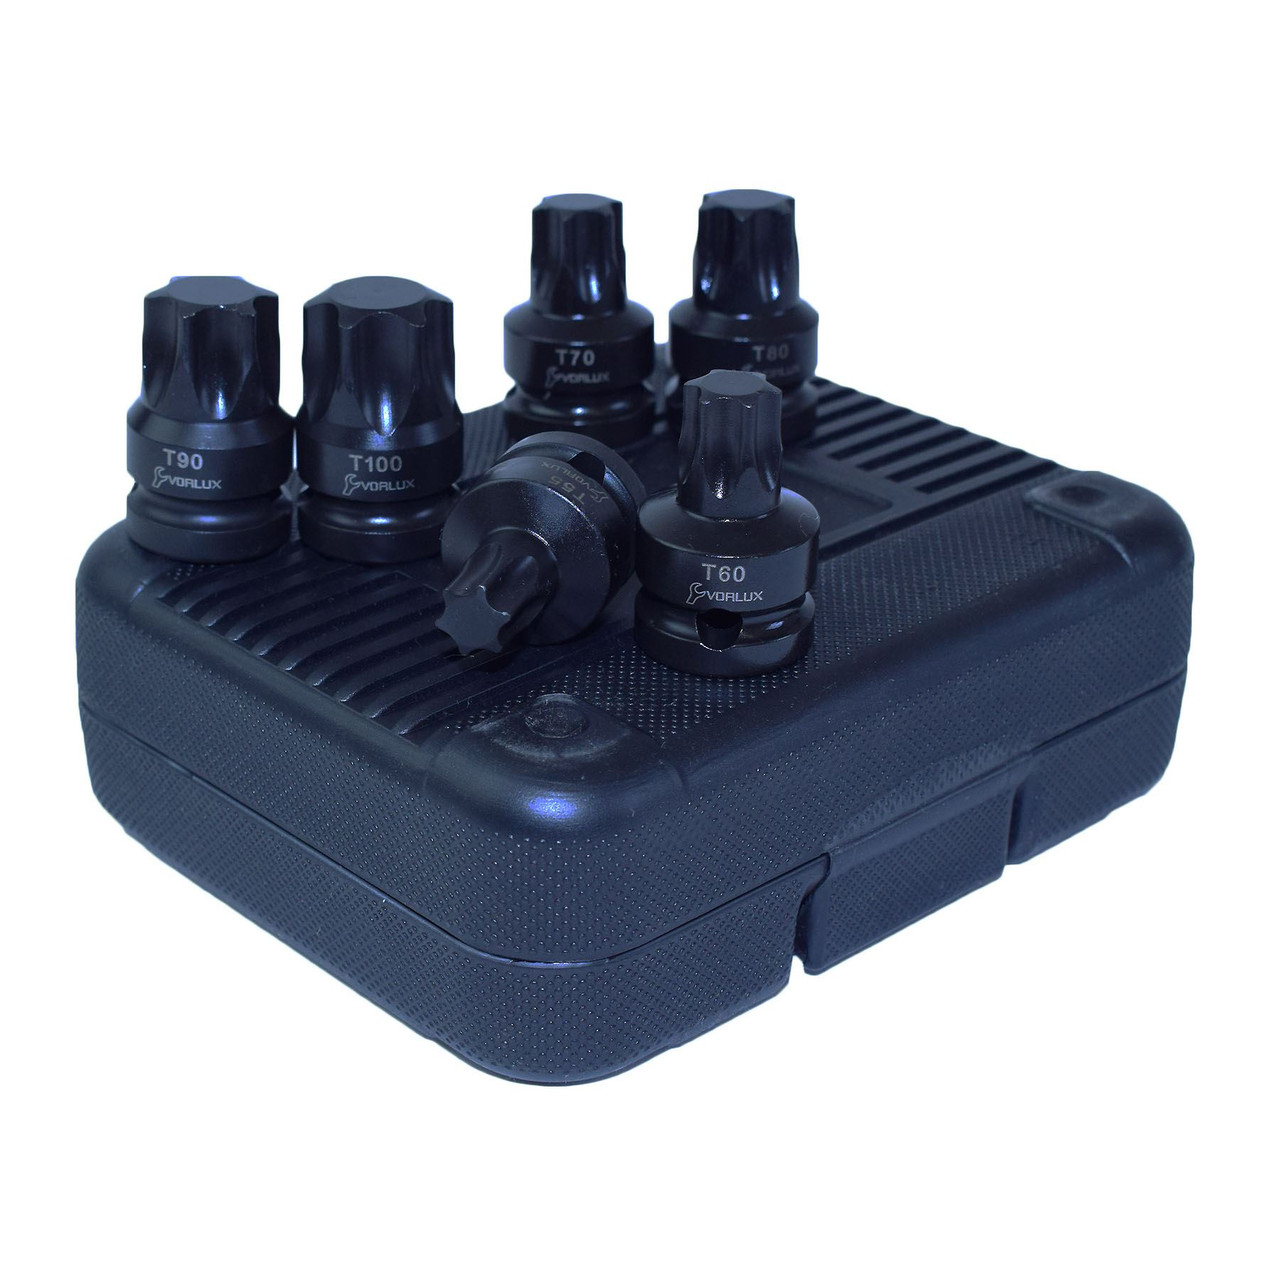 "Impact 1/2"" Drive Shallow Stubby Torx Star Male Bit Sockets T55 - T100 6pc Set"